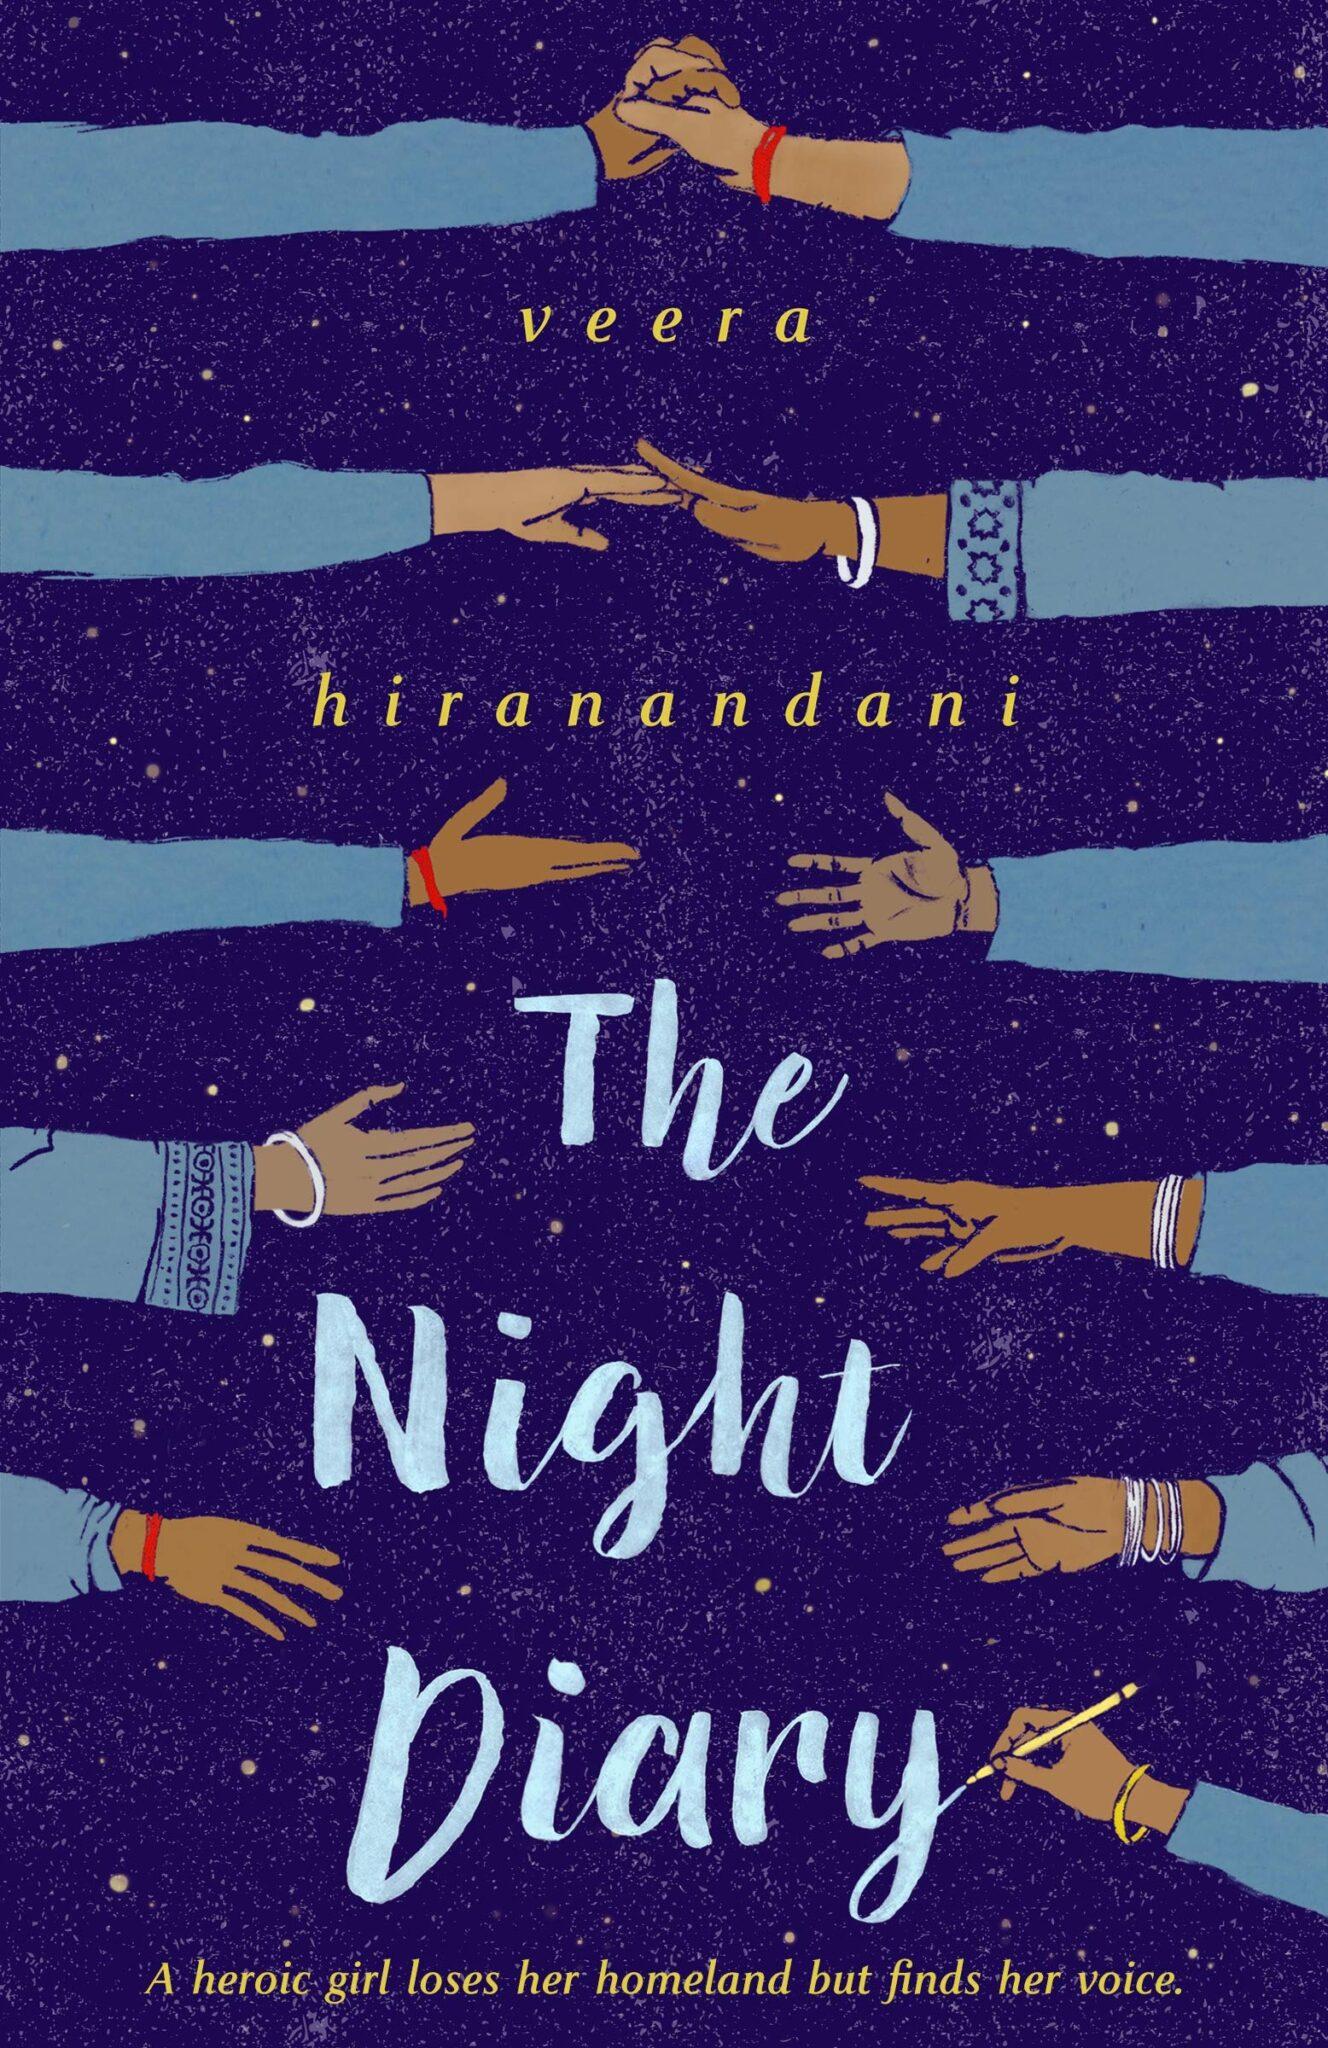 the night diary veera Hiranandani PB cover